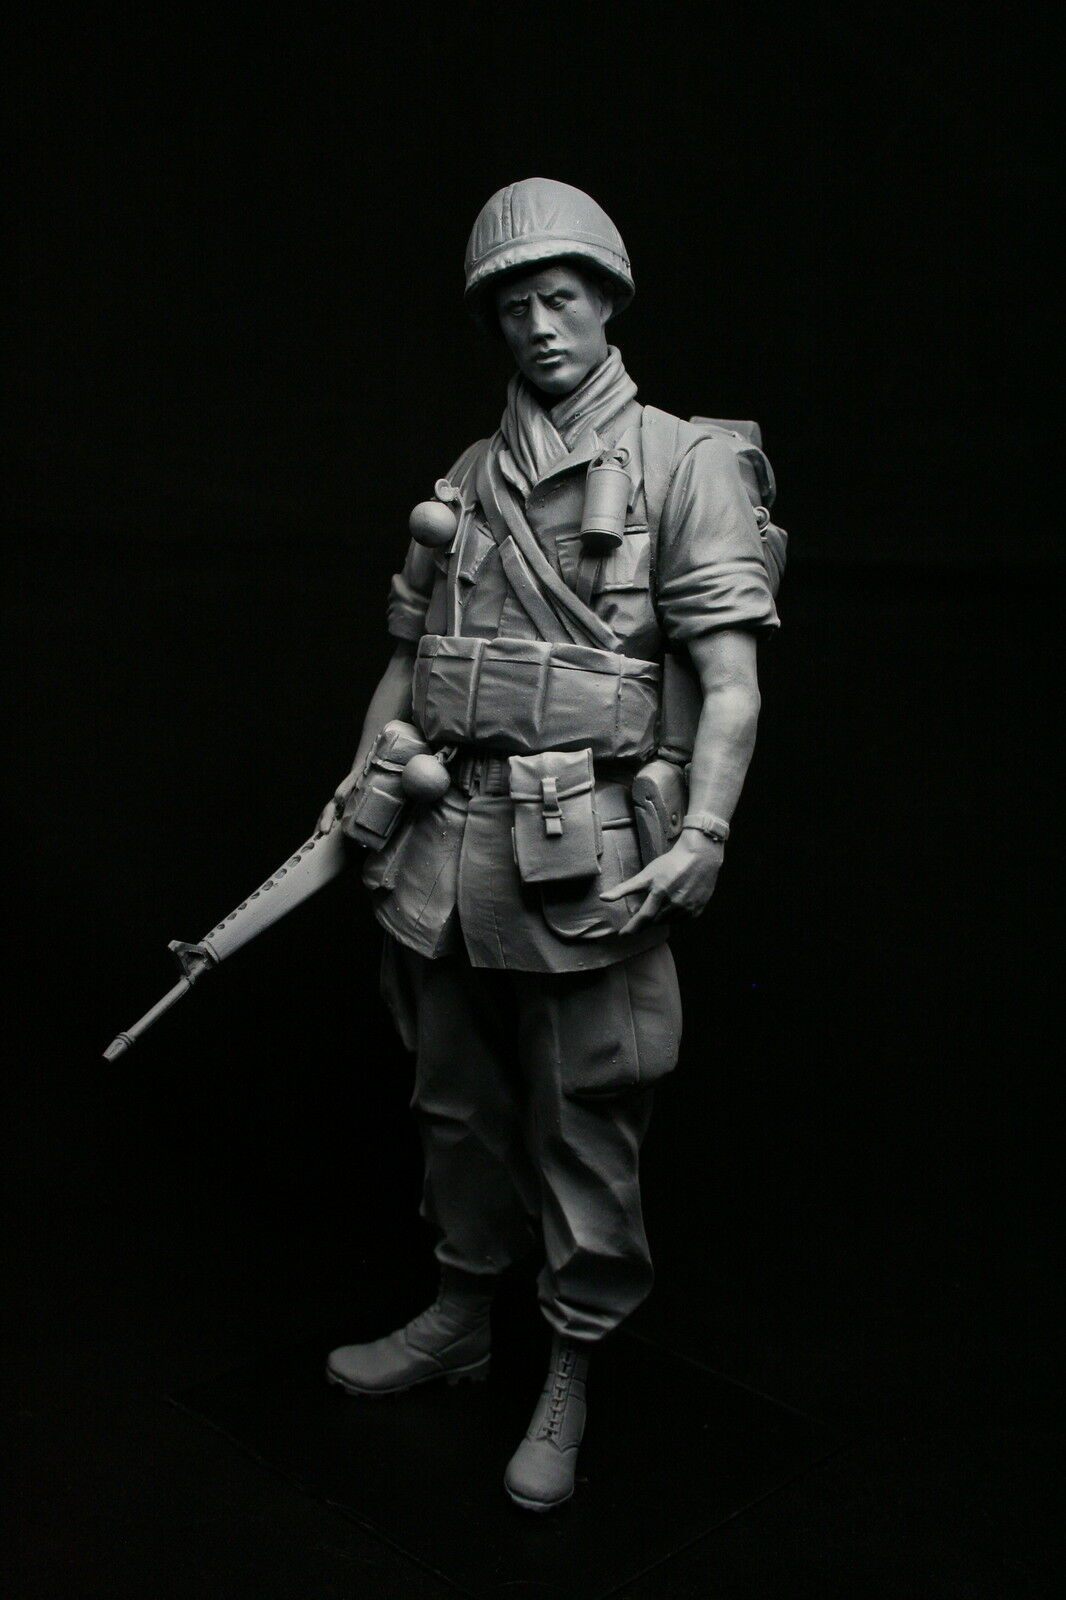 200mm 1 9 US Army Infantryman, Vietnam War